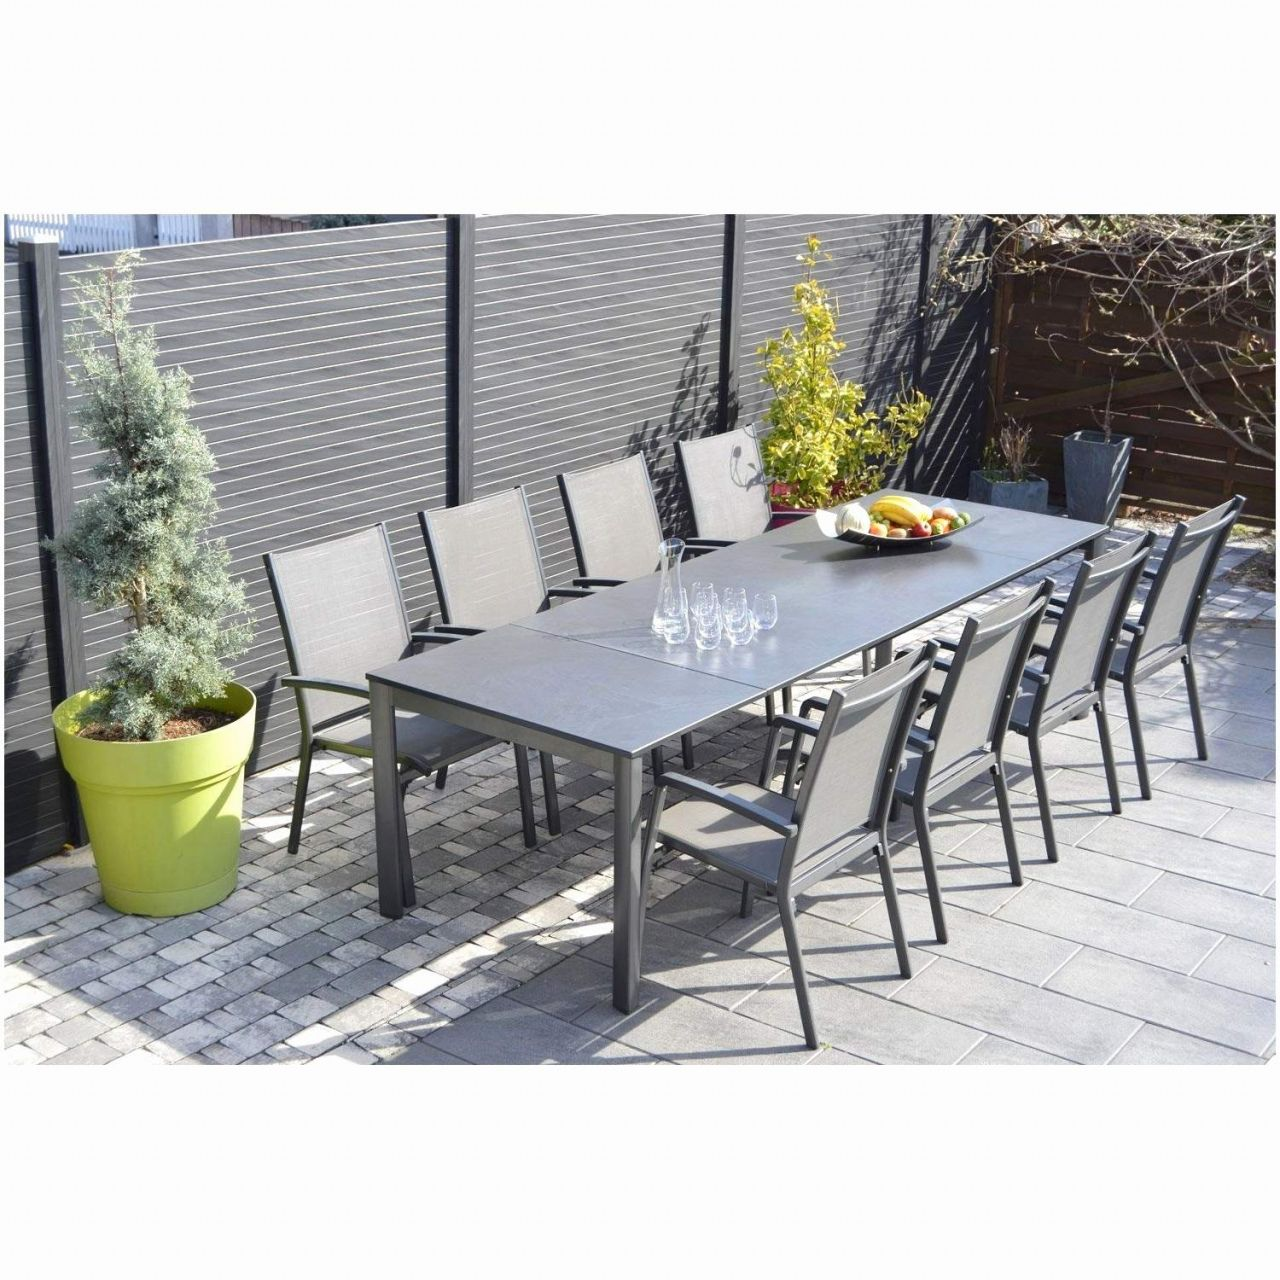 77 Ikea Table De Jardin Octobre 2018 Idée Couleur Salon In